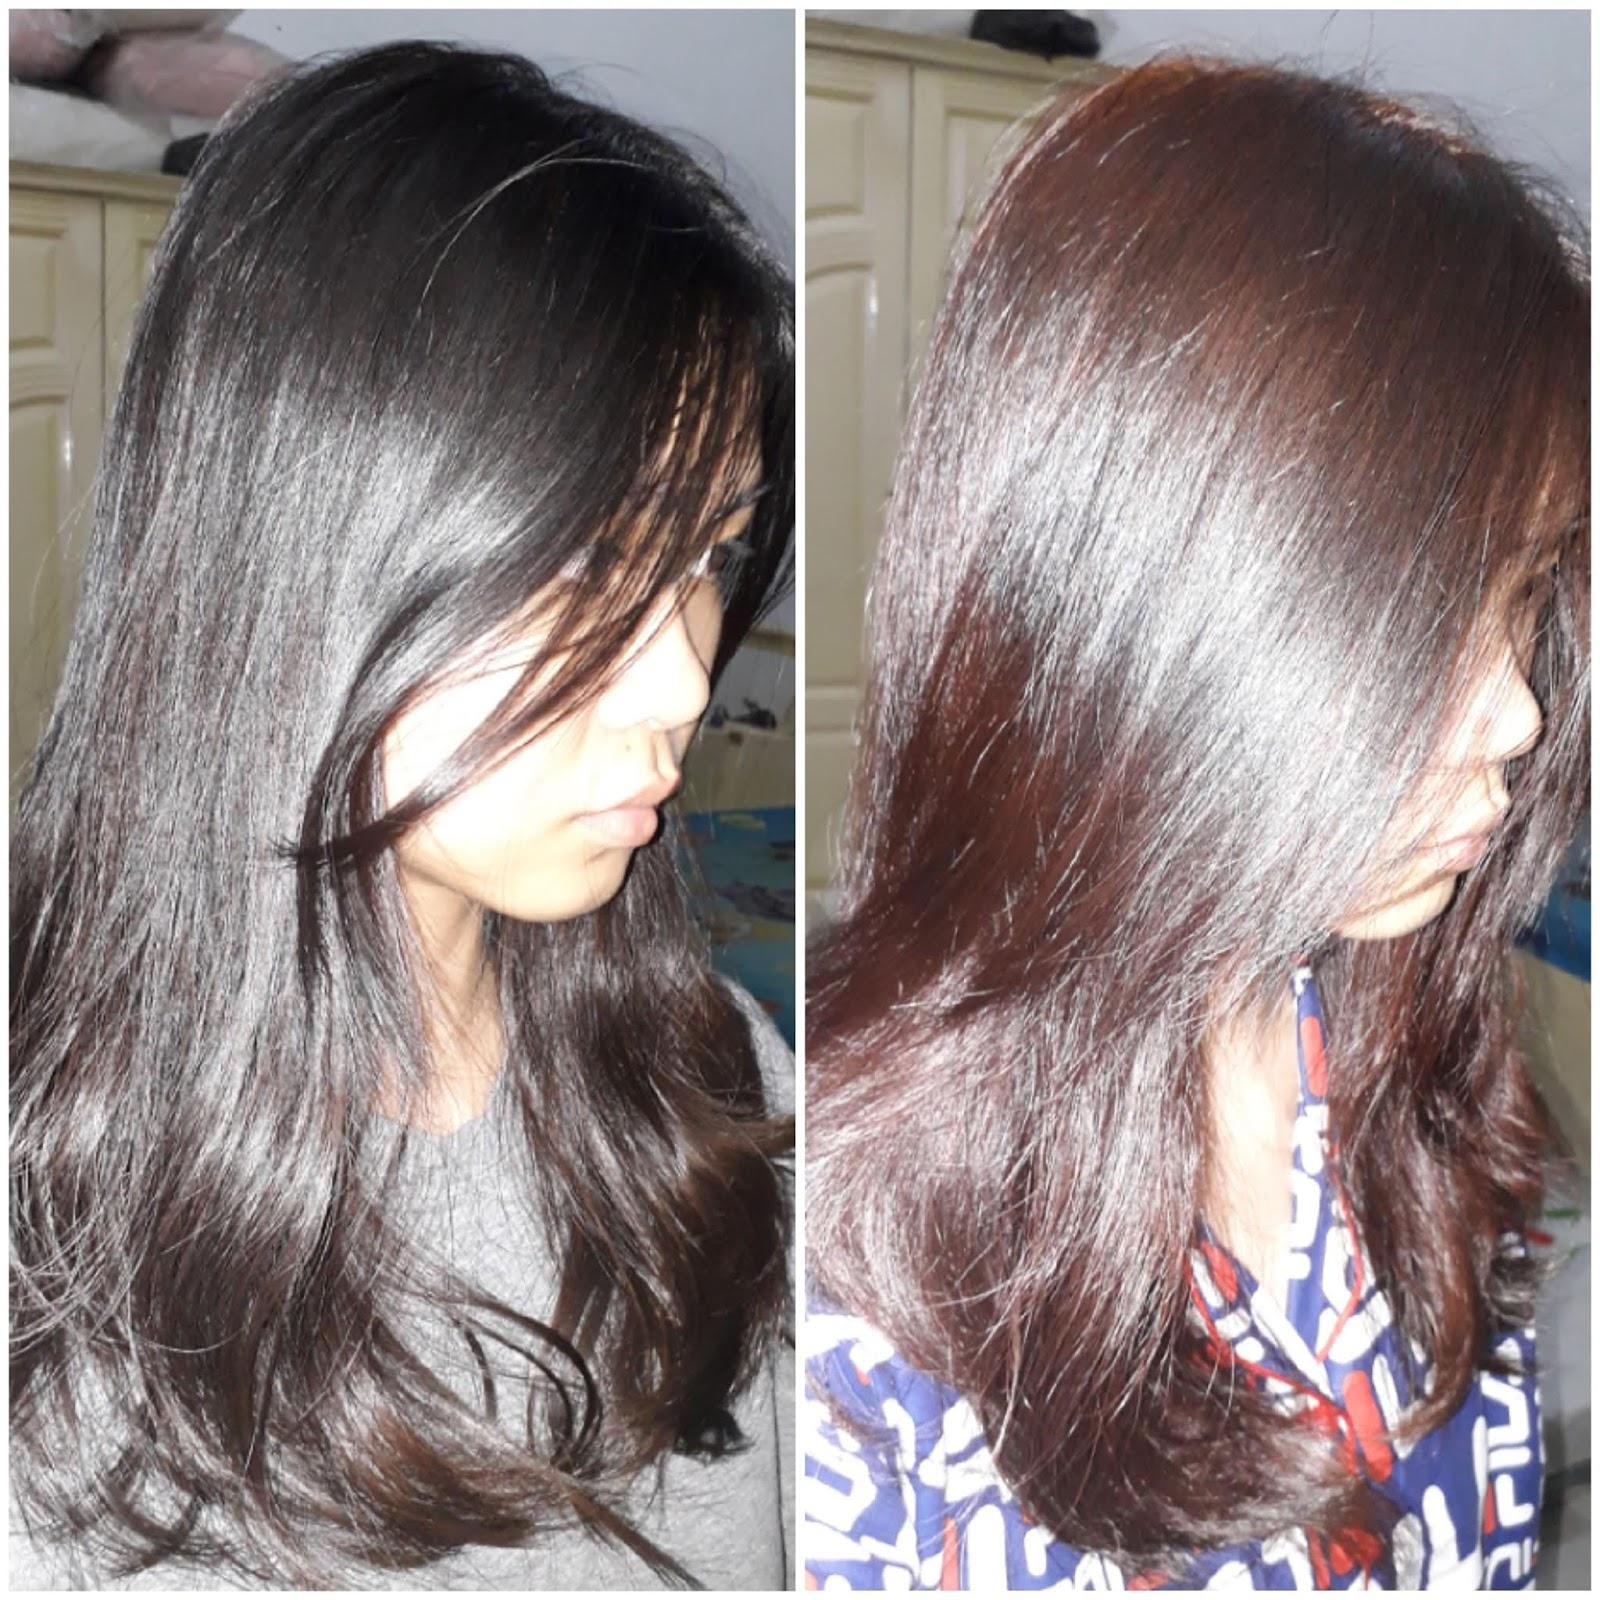 Beautylabo Guardian: ~christalialie~: Beautylabo Hair Color (Candy Apricot) Review